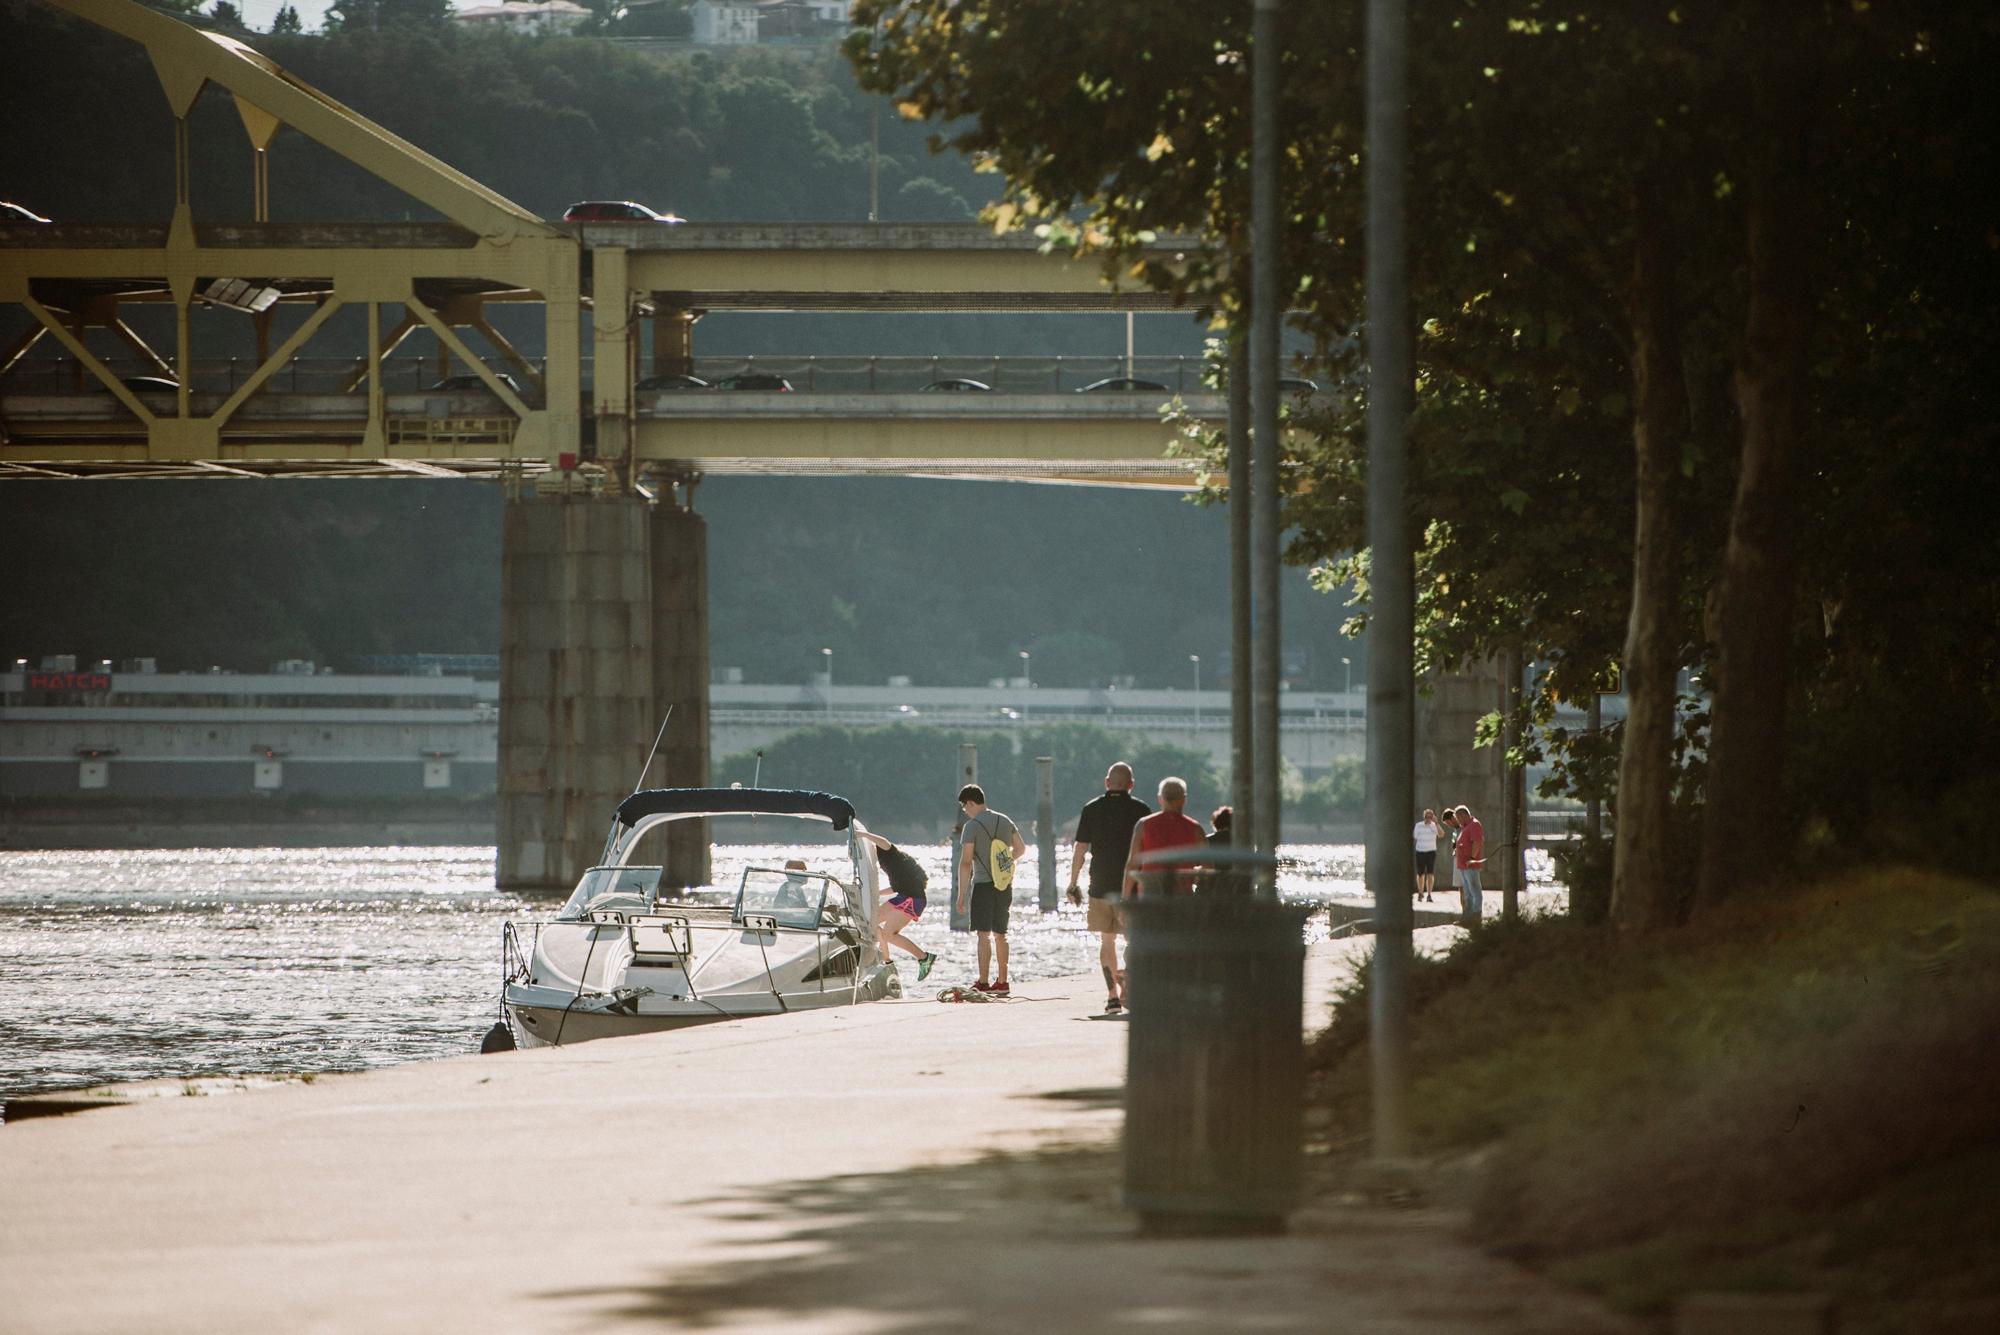 0099Jorge-Clara-Proposal-Pittsburgh_Proposal-Pittsburgh-Constructed-Adventures-Sandrachile.jpg